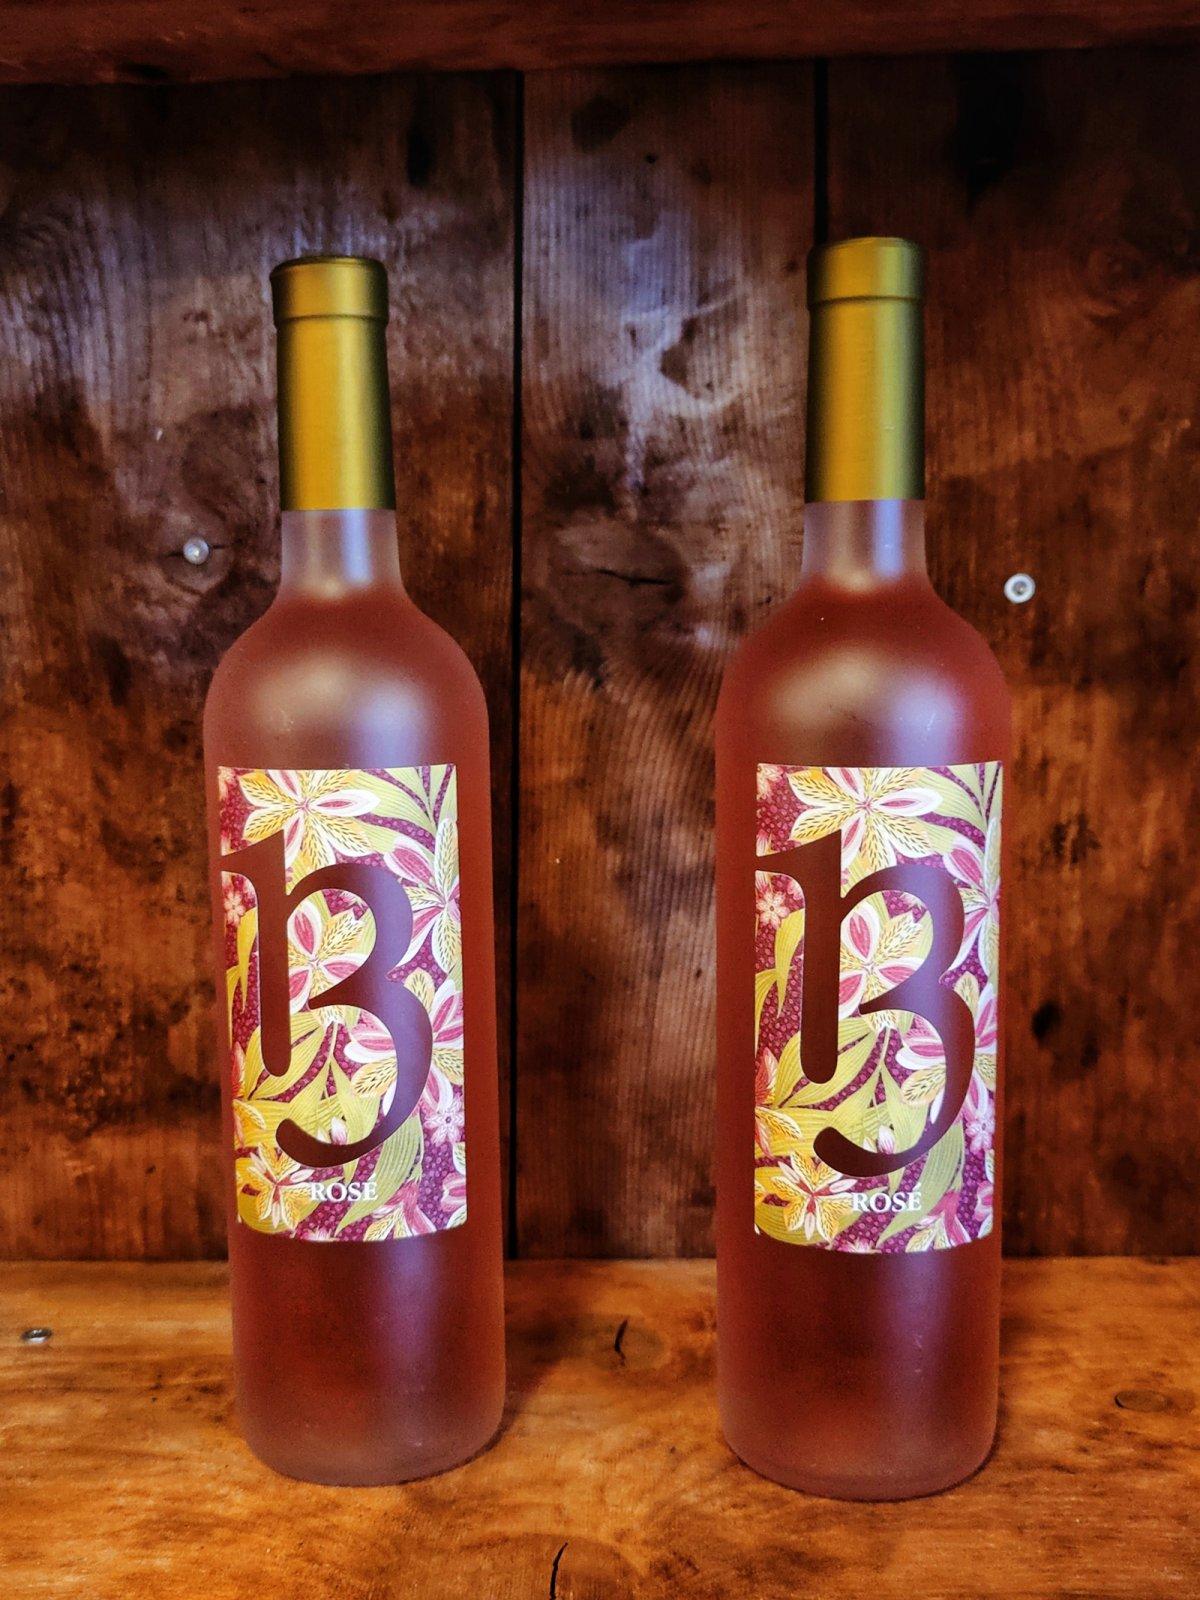 Tenuta Castello Morcote Vineyard - Rosé 13